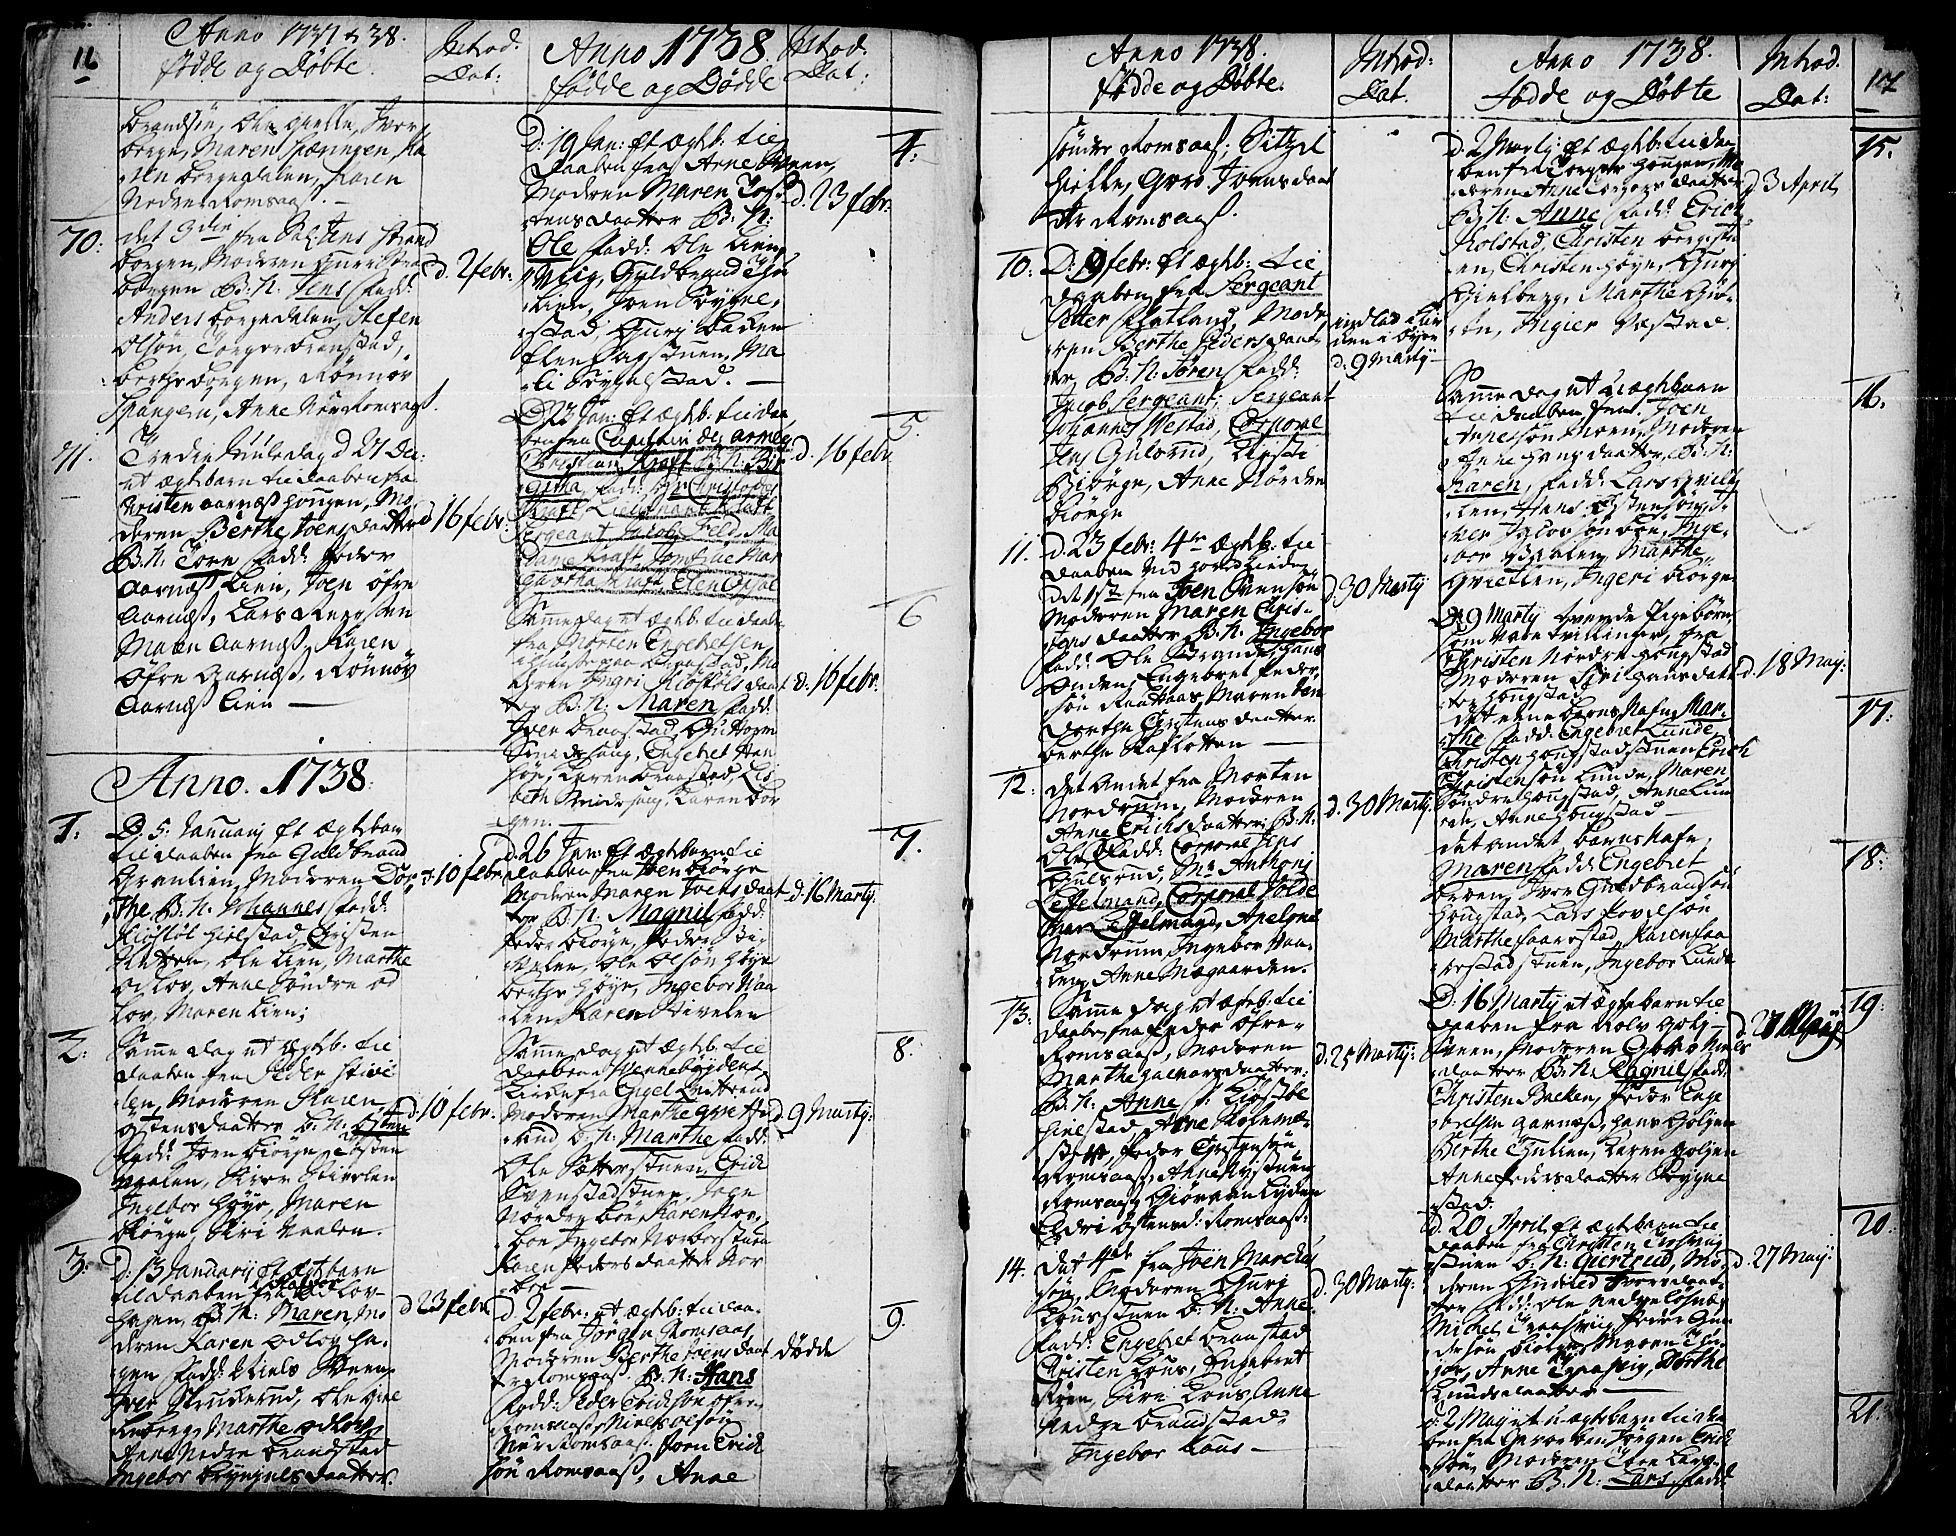 SAH, Ringebu prestekontor, Ministerialbok nr. 2, 1734-1780, s. 16-17